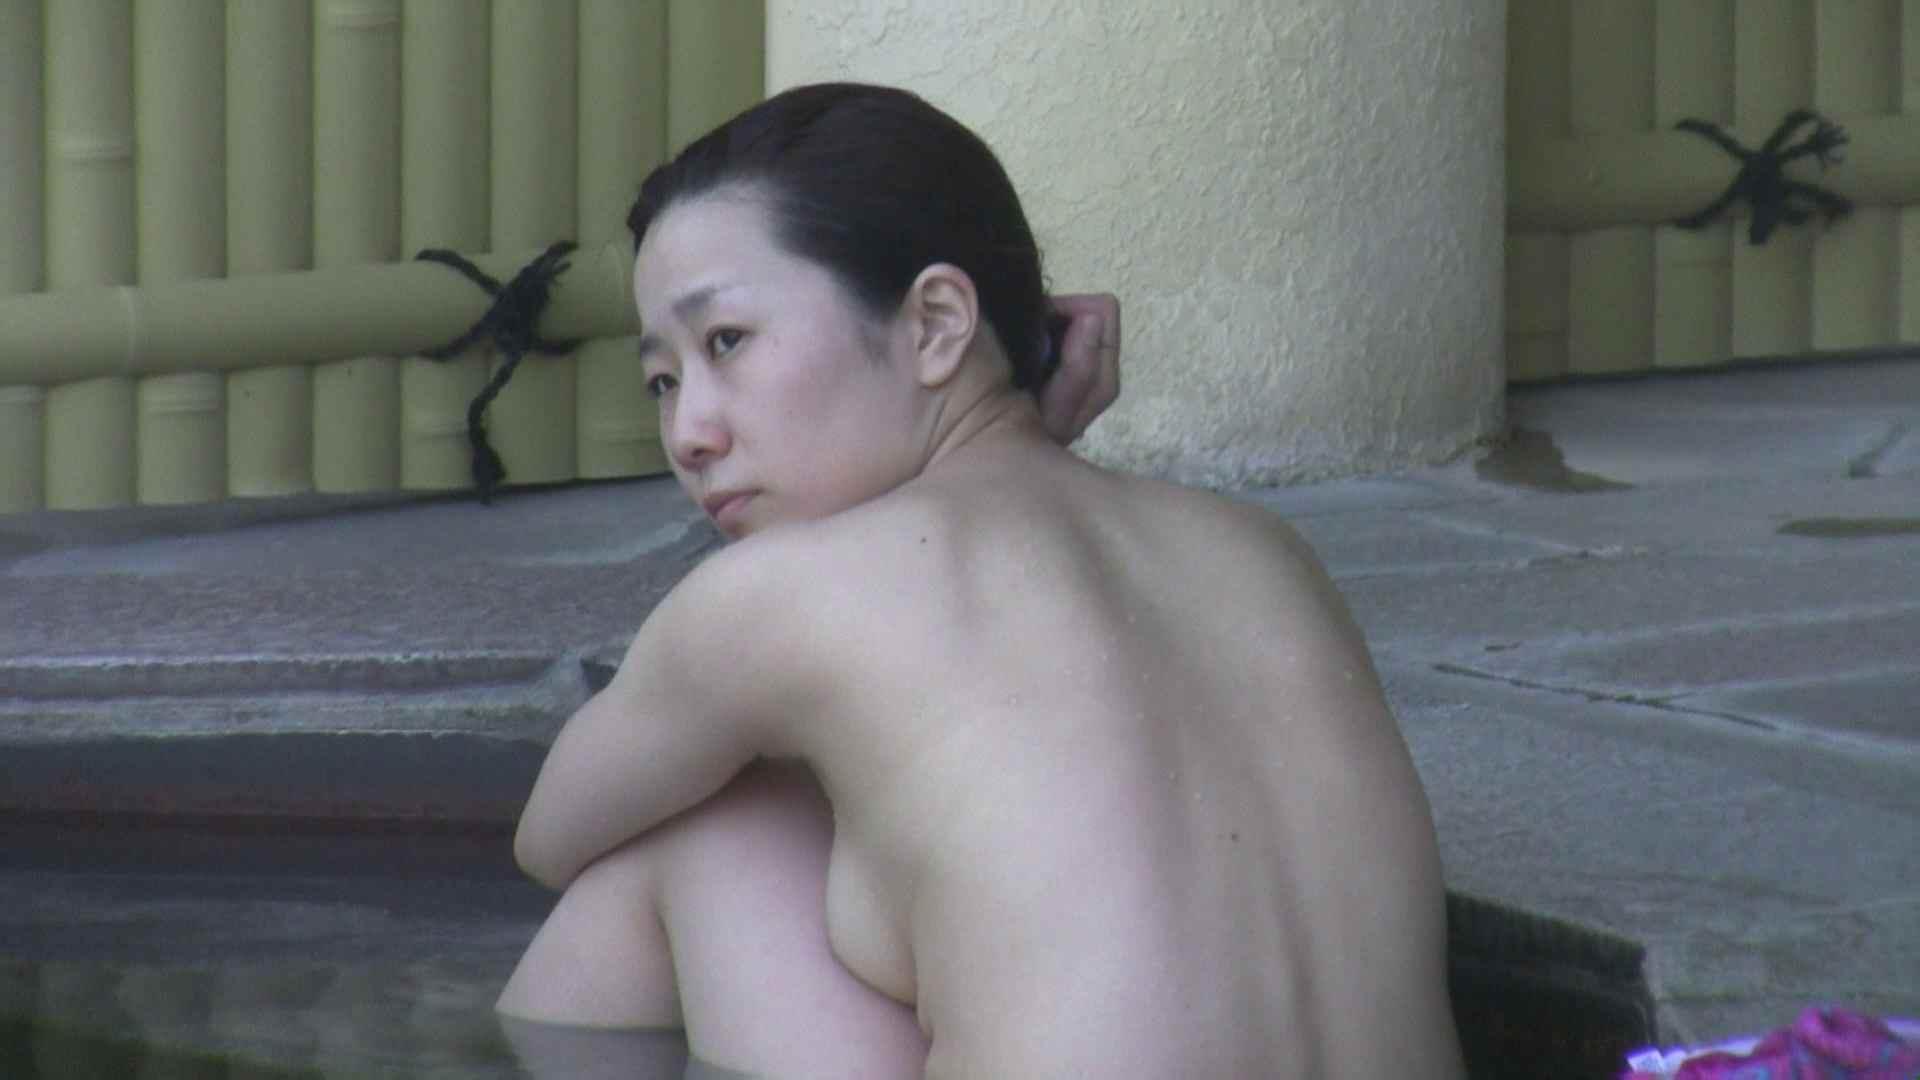 Aquaな露天風呂Vol.88【VIP限定】 OLのエロ生活 | 露天風呂  61連発 13